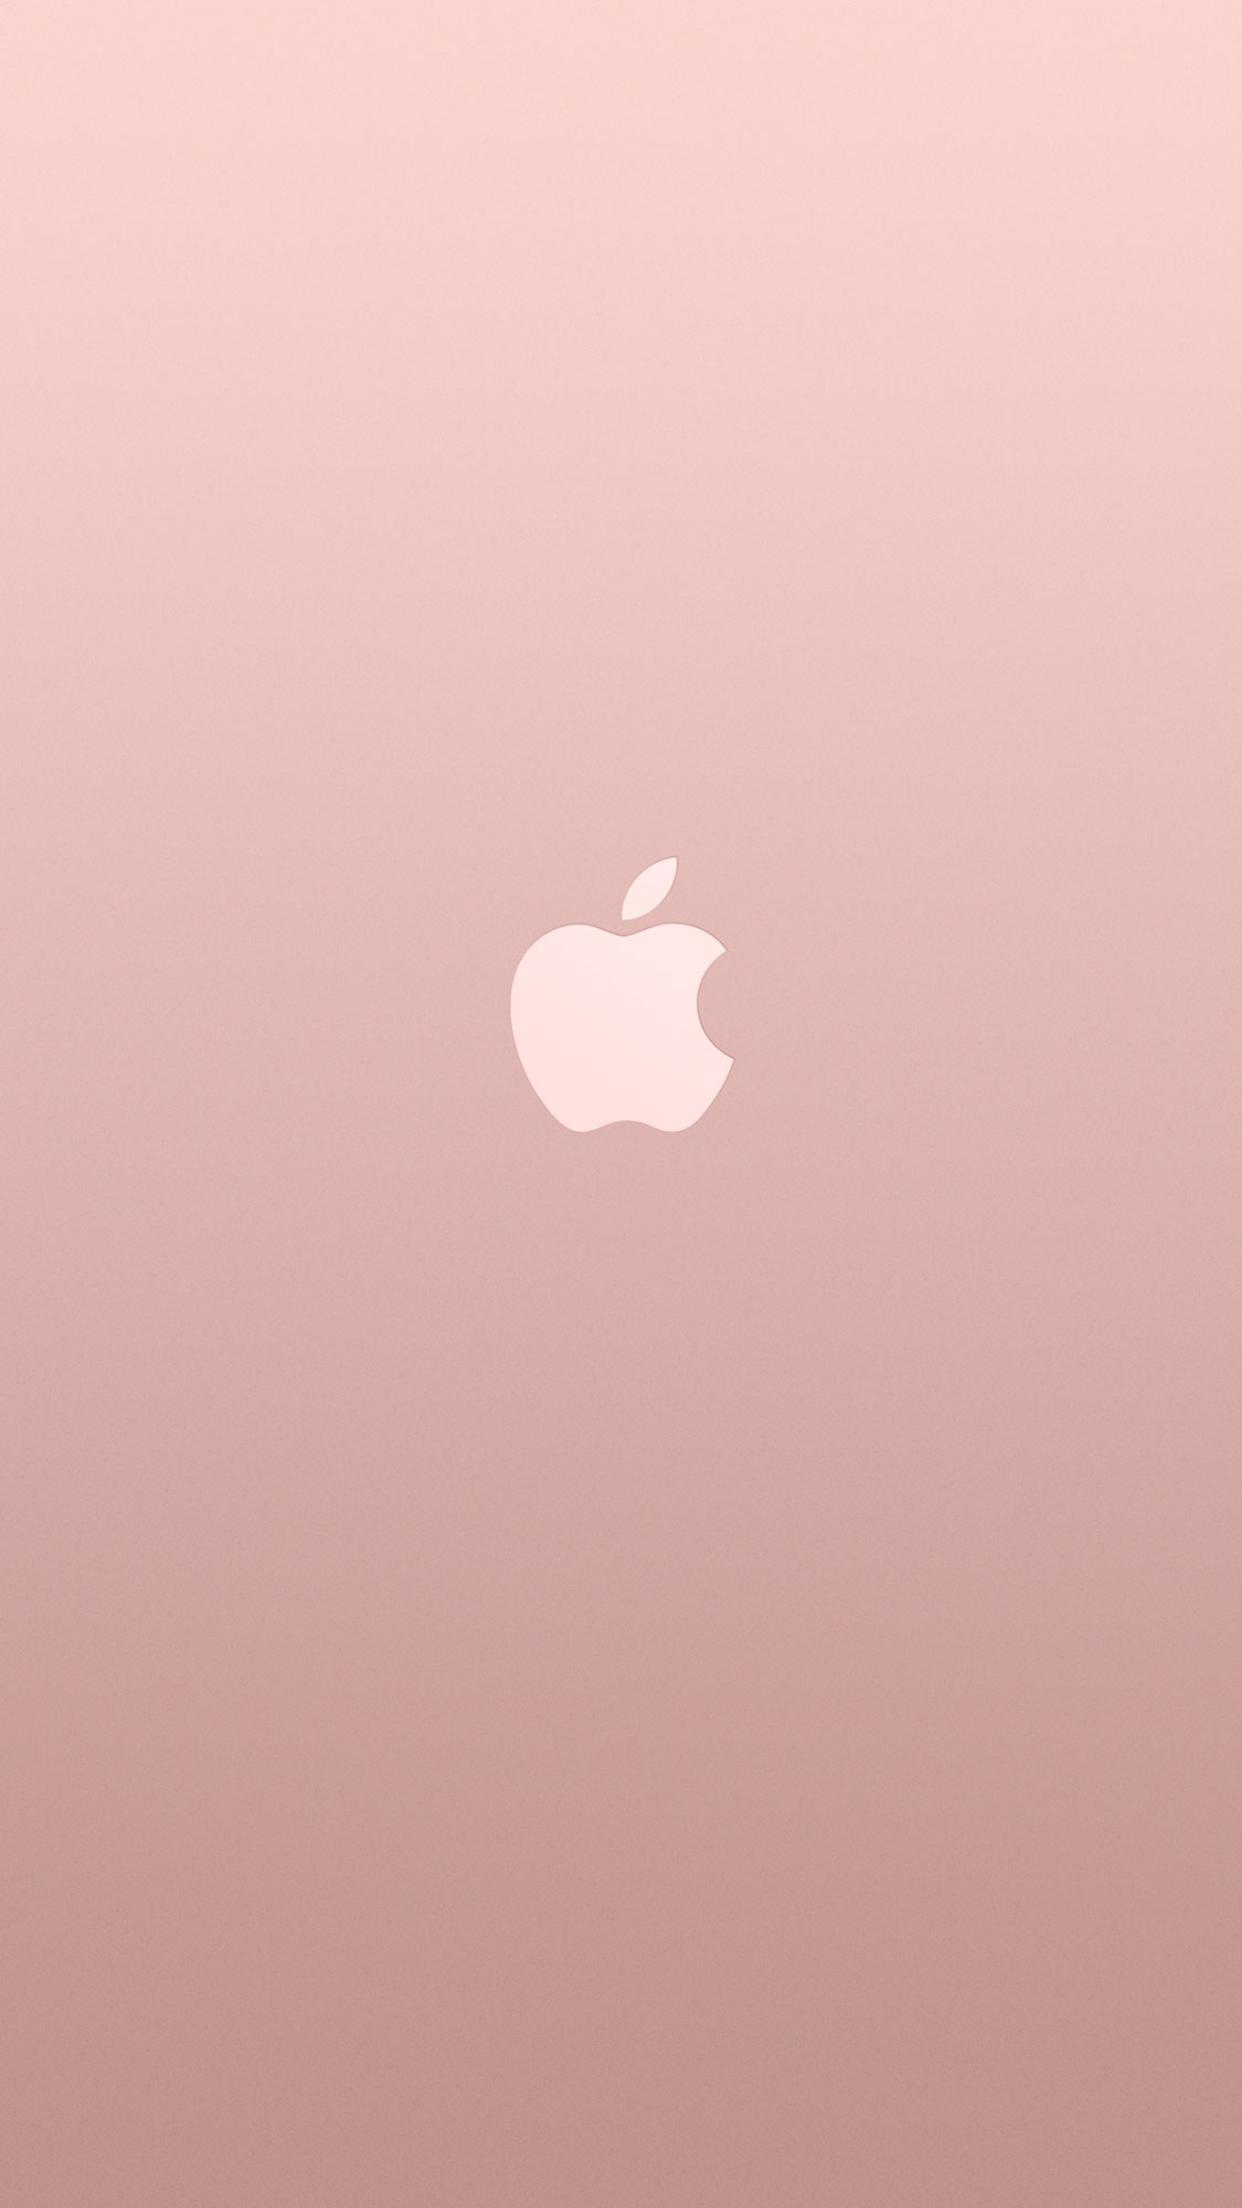 Tech Wallpapers Gold Wallpaper Iphone Pink Wallpaper Iphone Iphone 6 Wallpaper